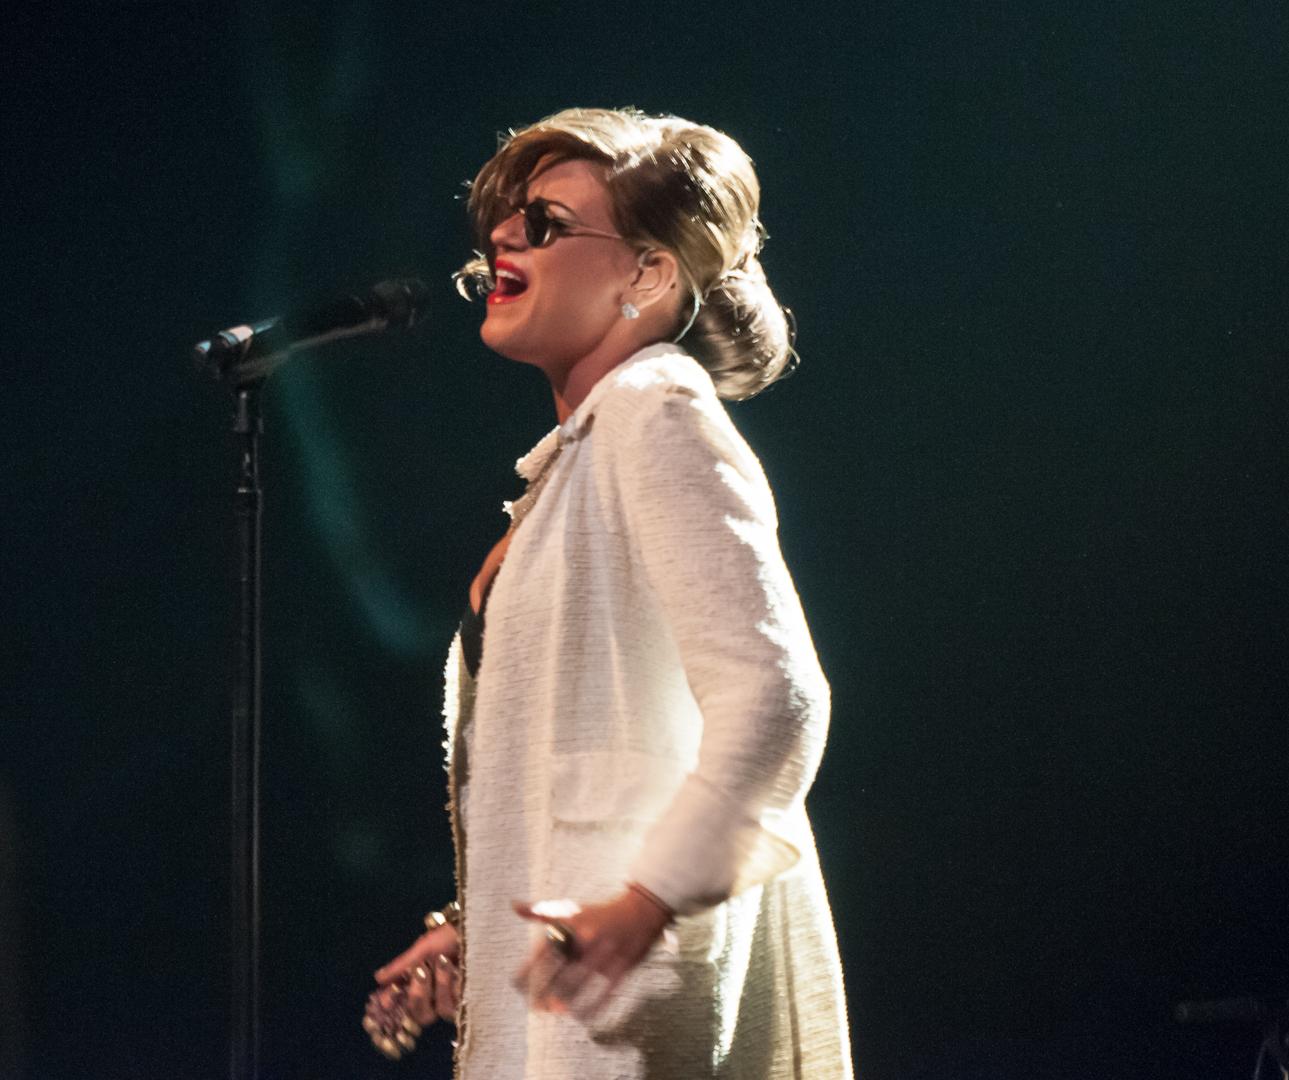 Melody Gardot at the Montreal International Jazz Festival 2012